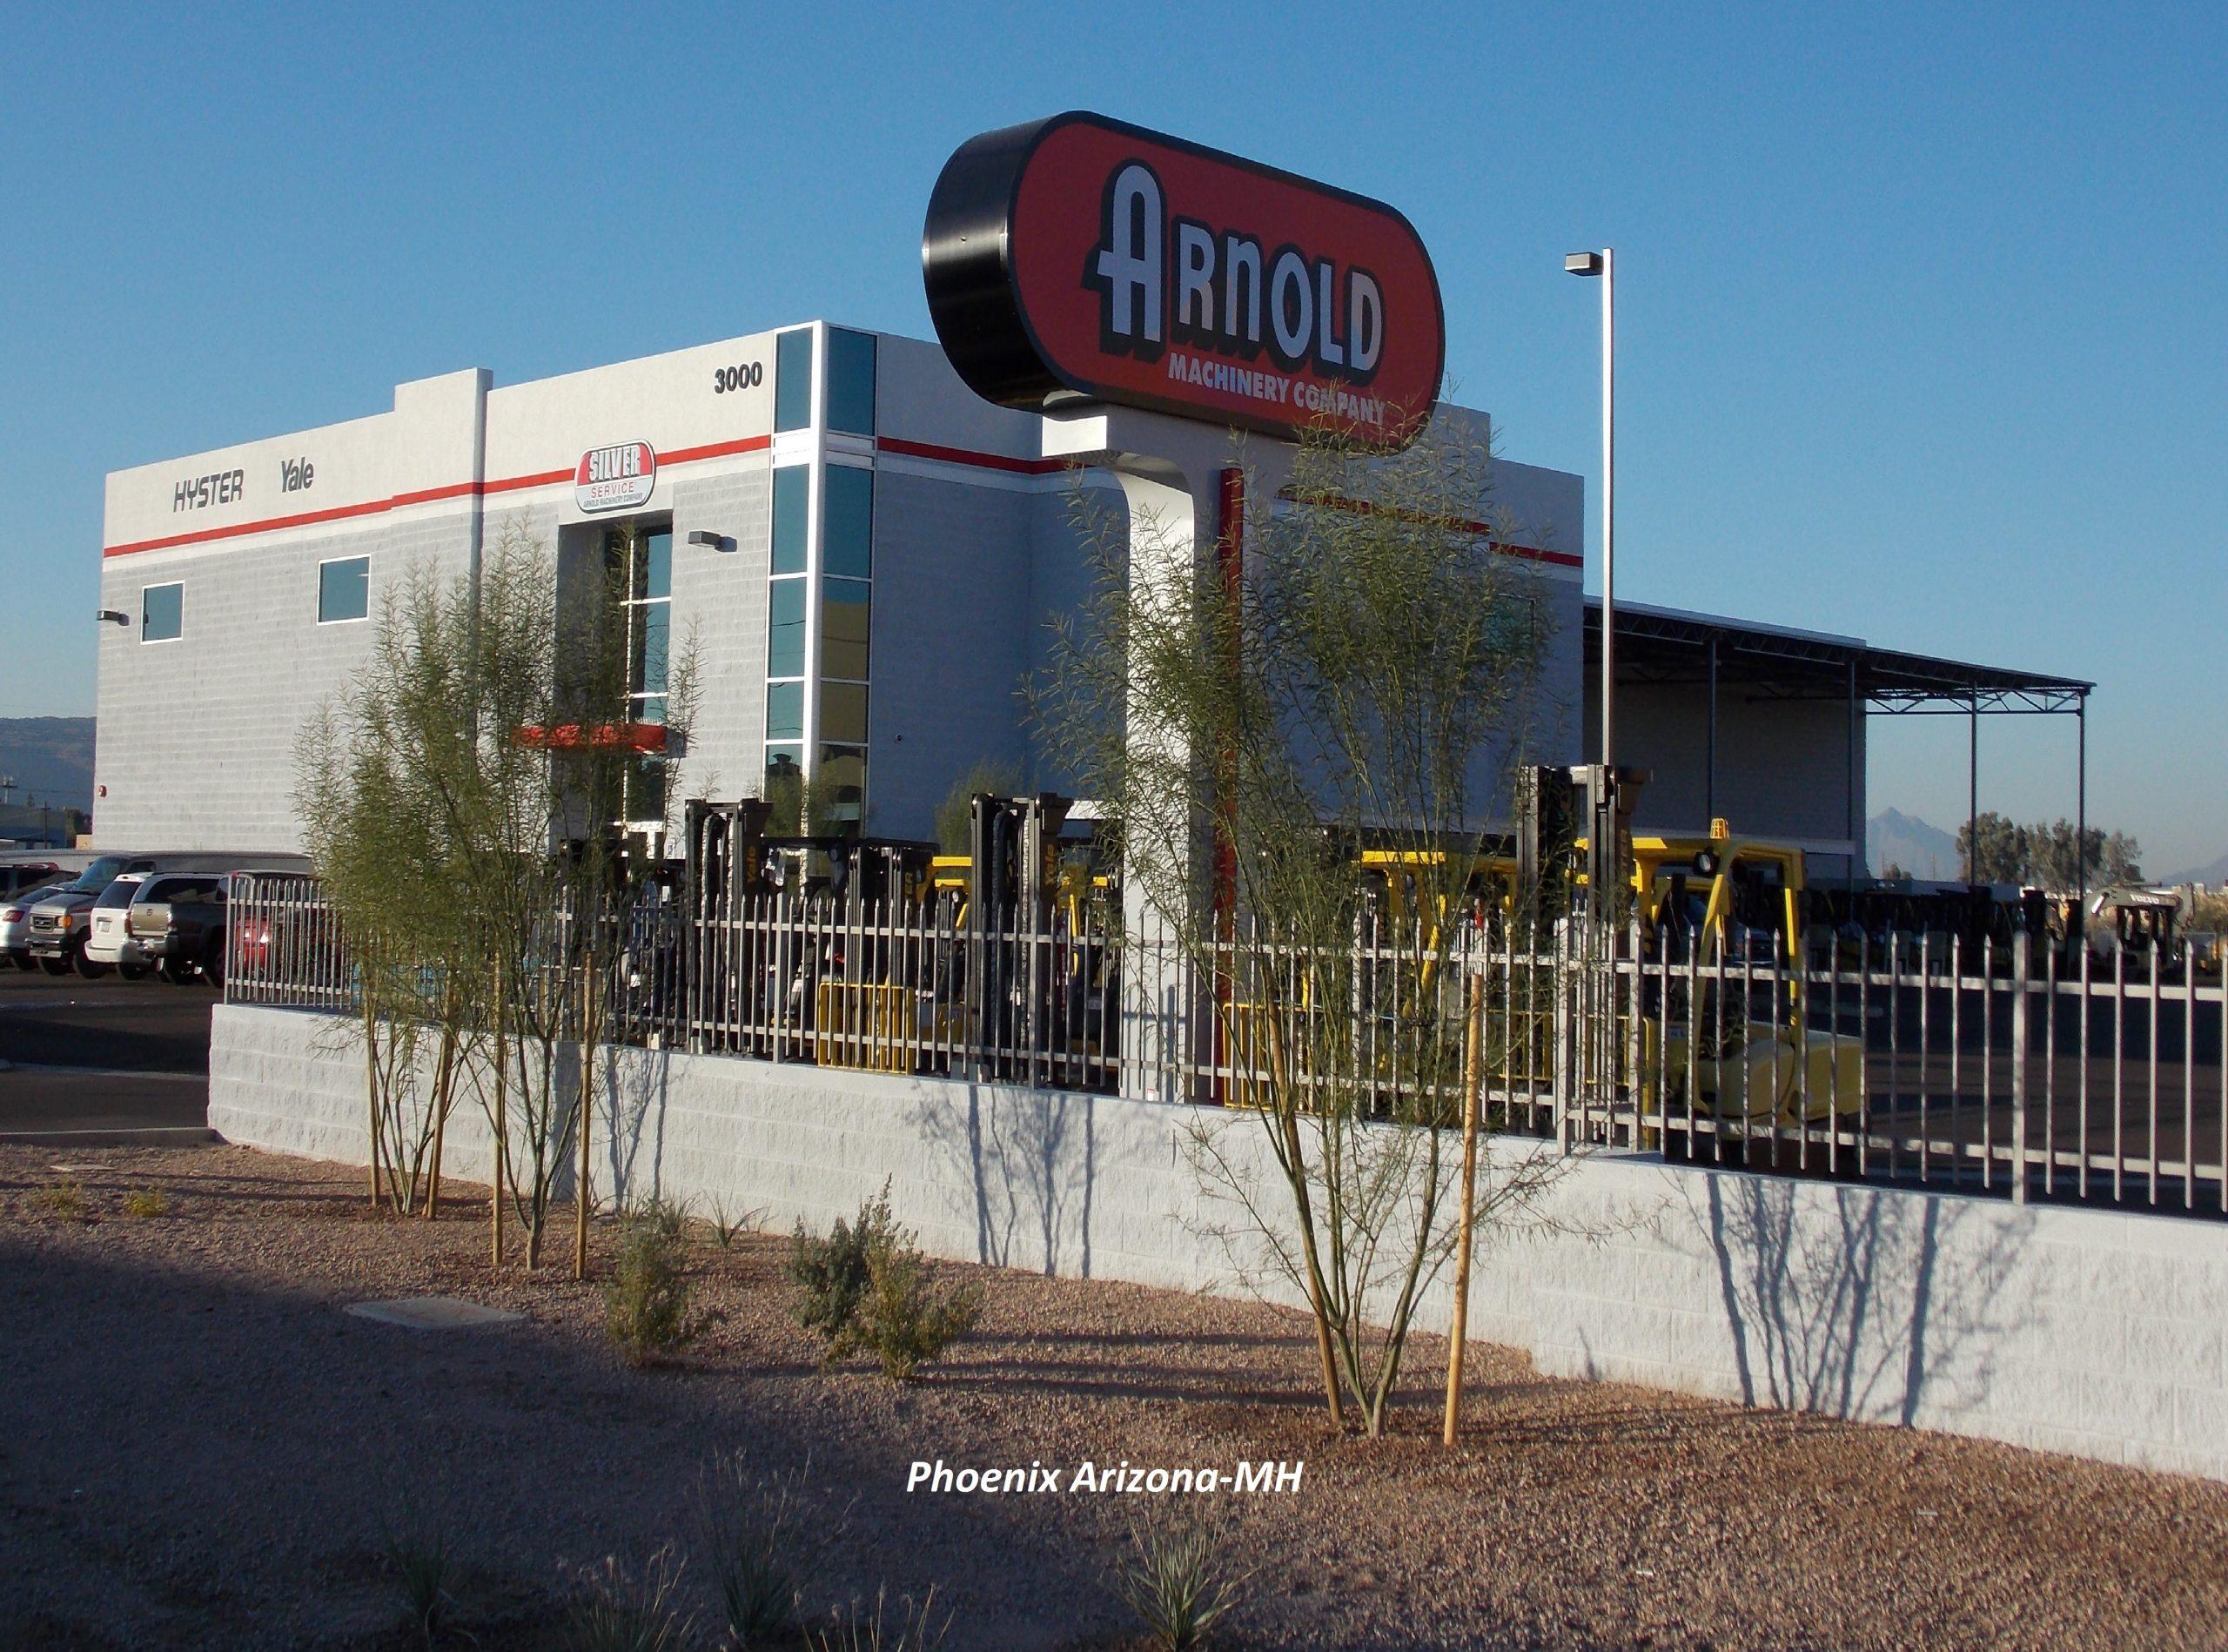 Arnold Machinery Phoenix Arizona